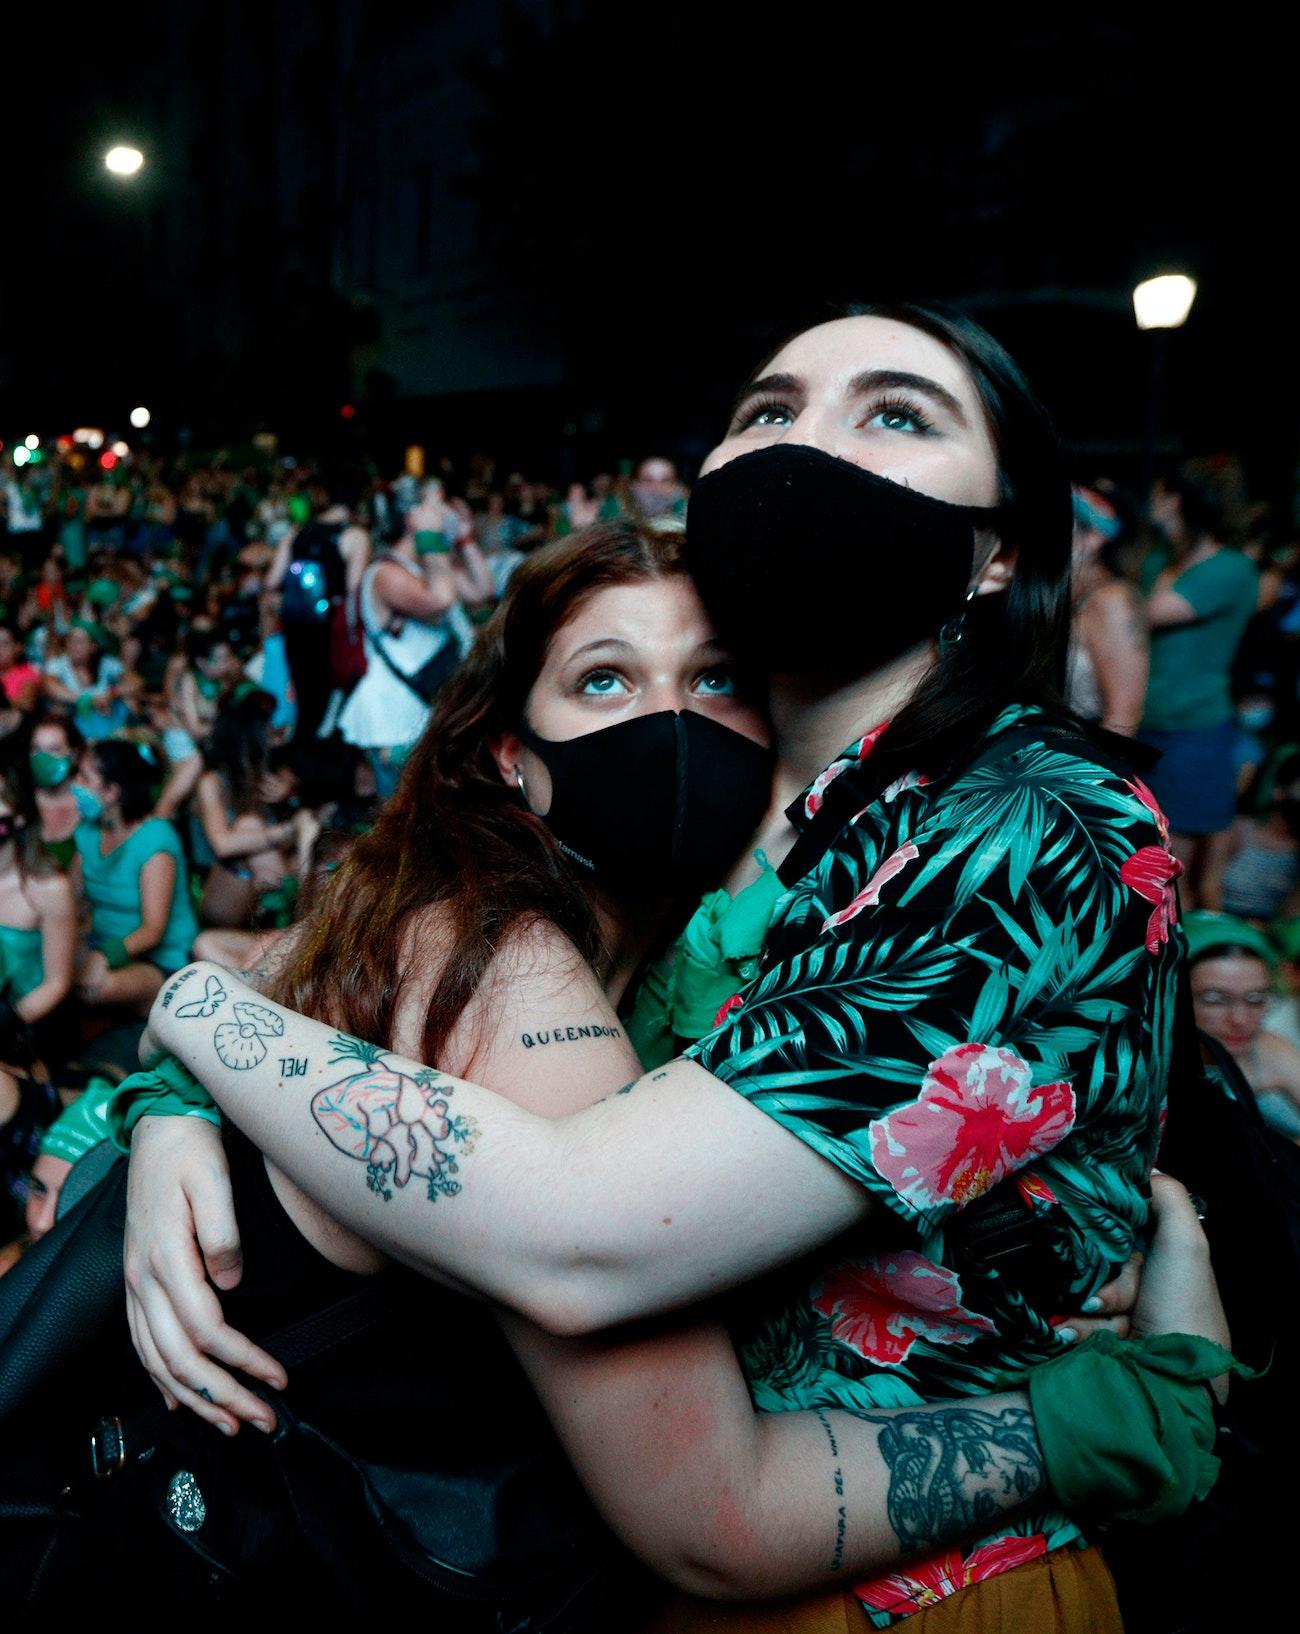 Two women wearing masks embracing among a large crowd